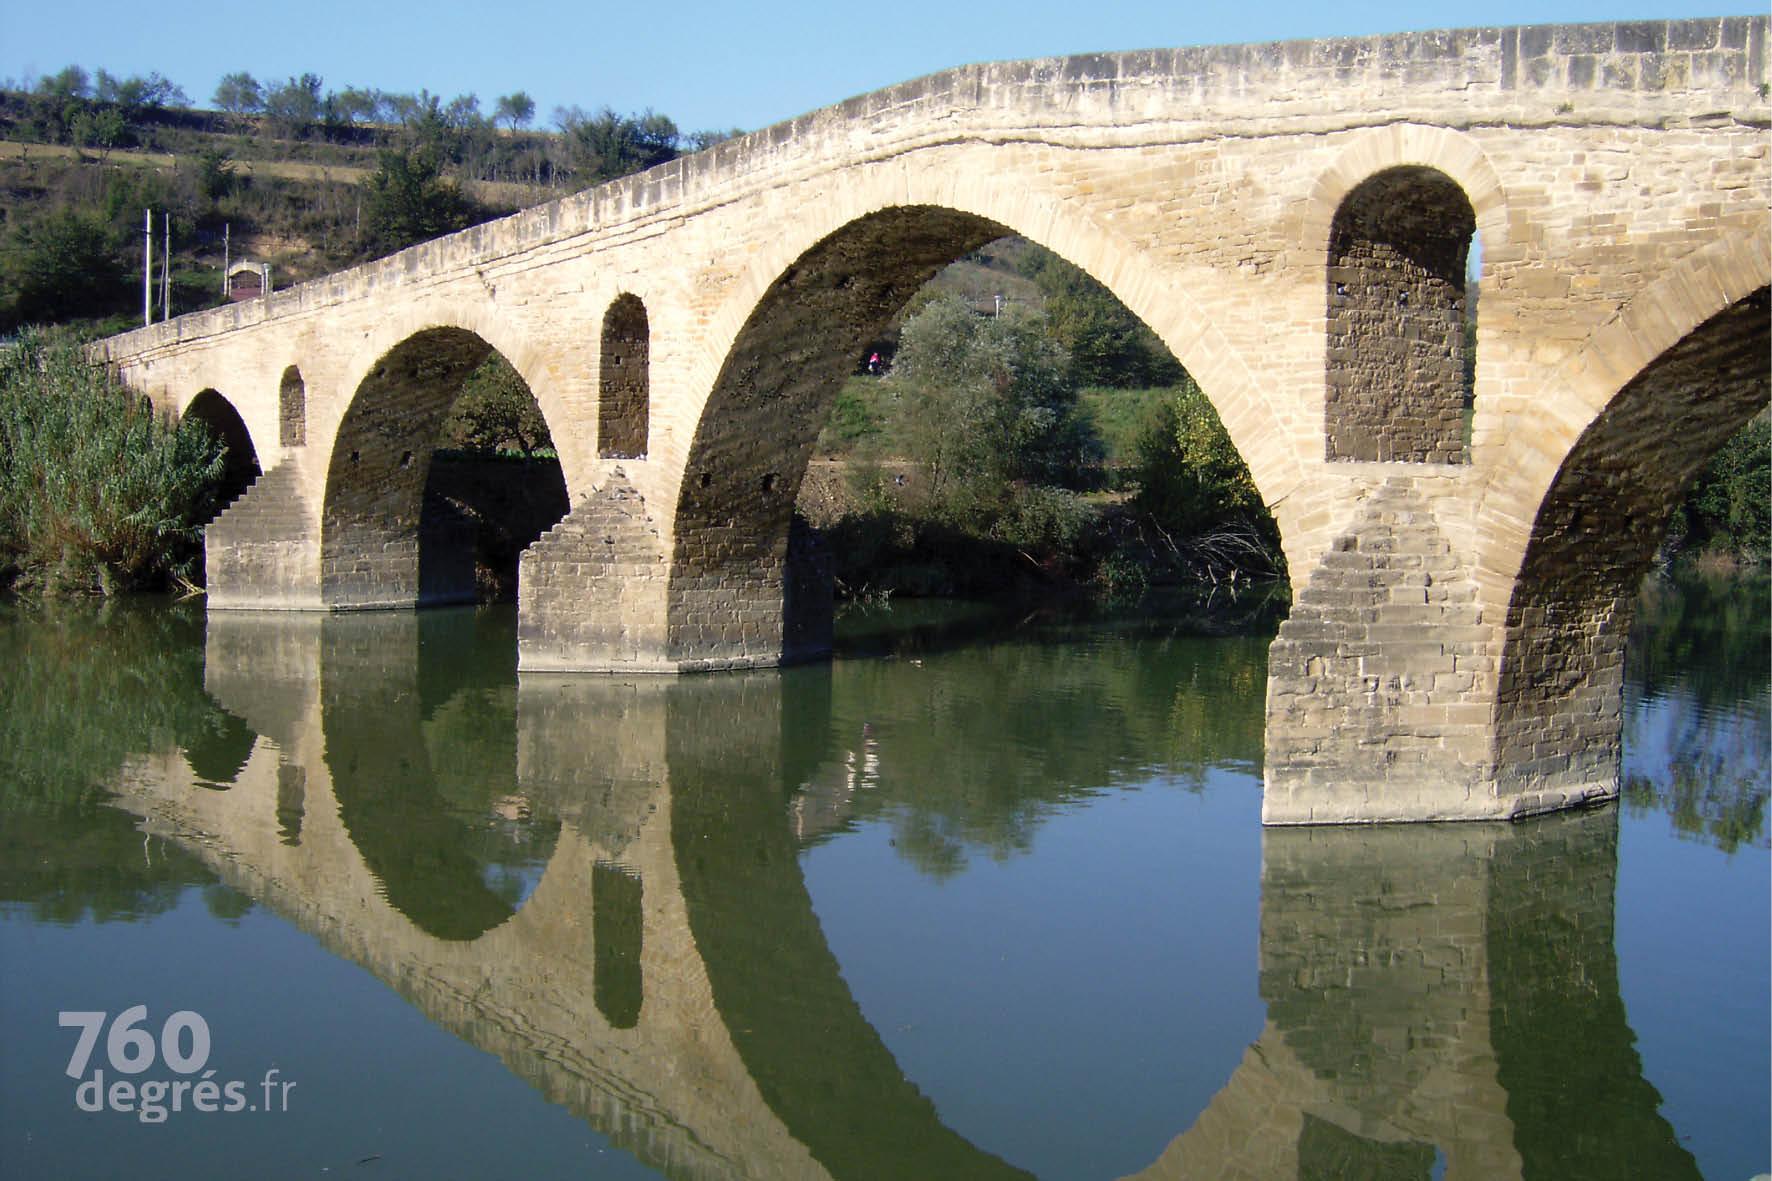 760degres-pays-basque-puente-la-reina-03